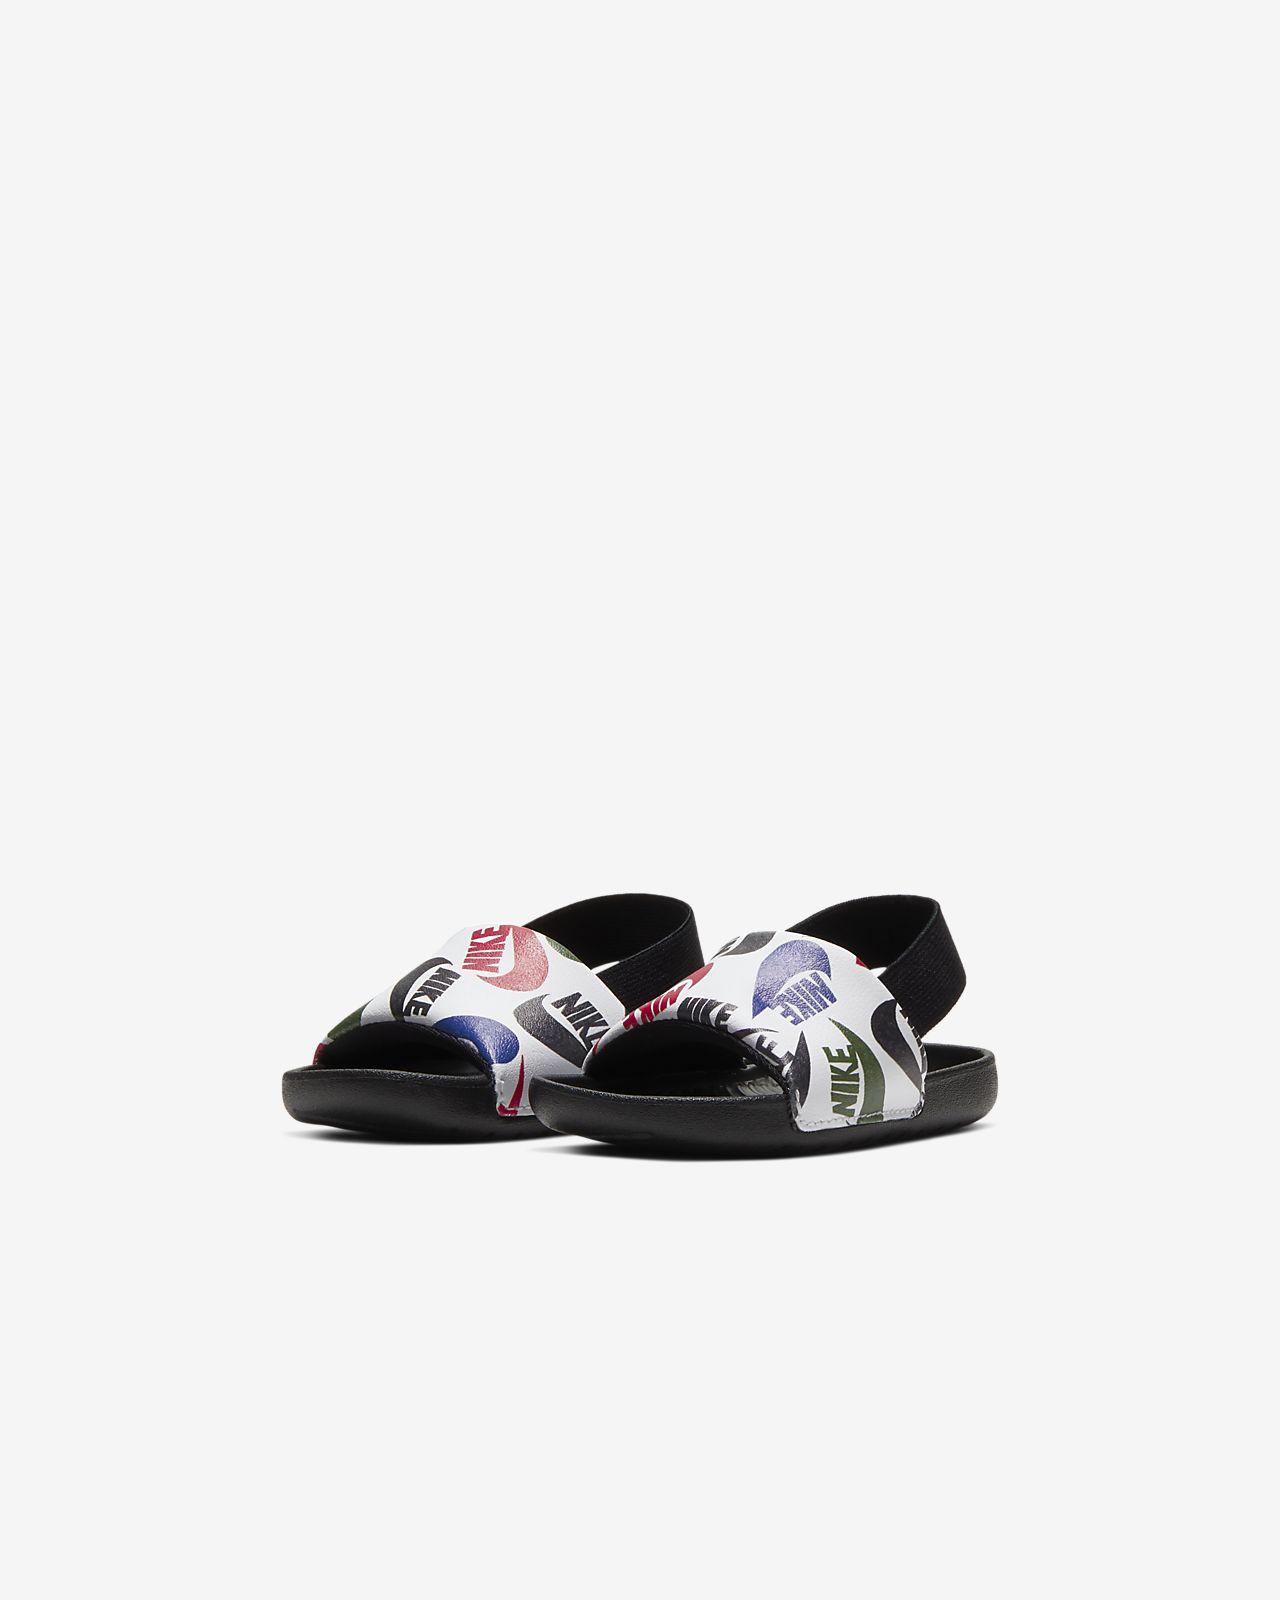 Badtoffel Nike Kawa SE JDI för babysmå barn